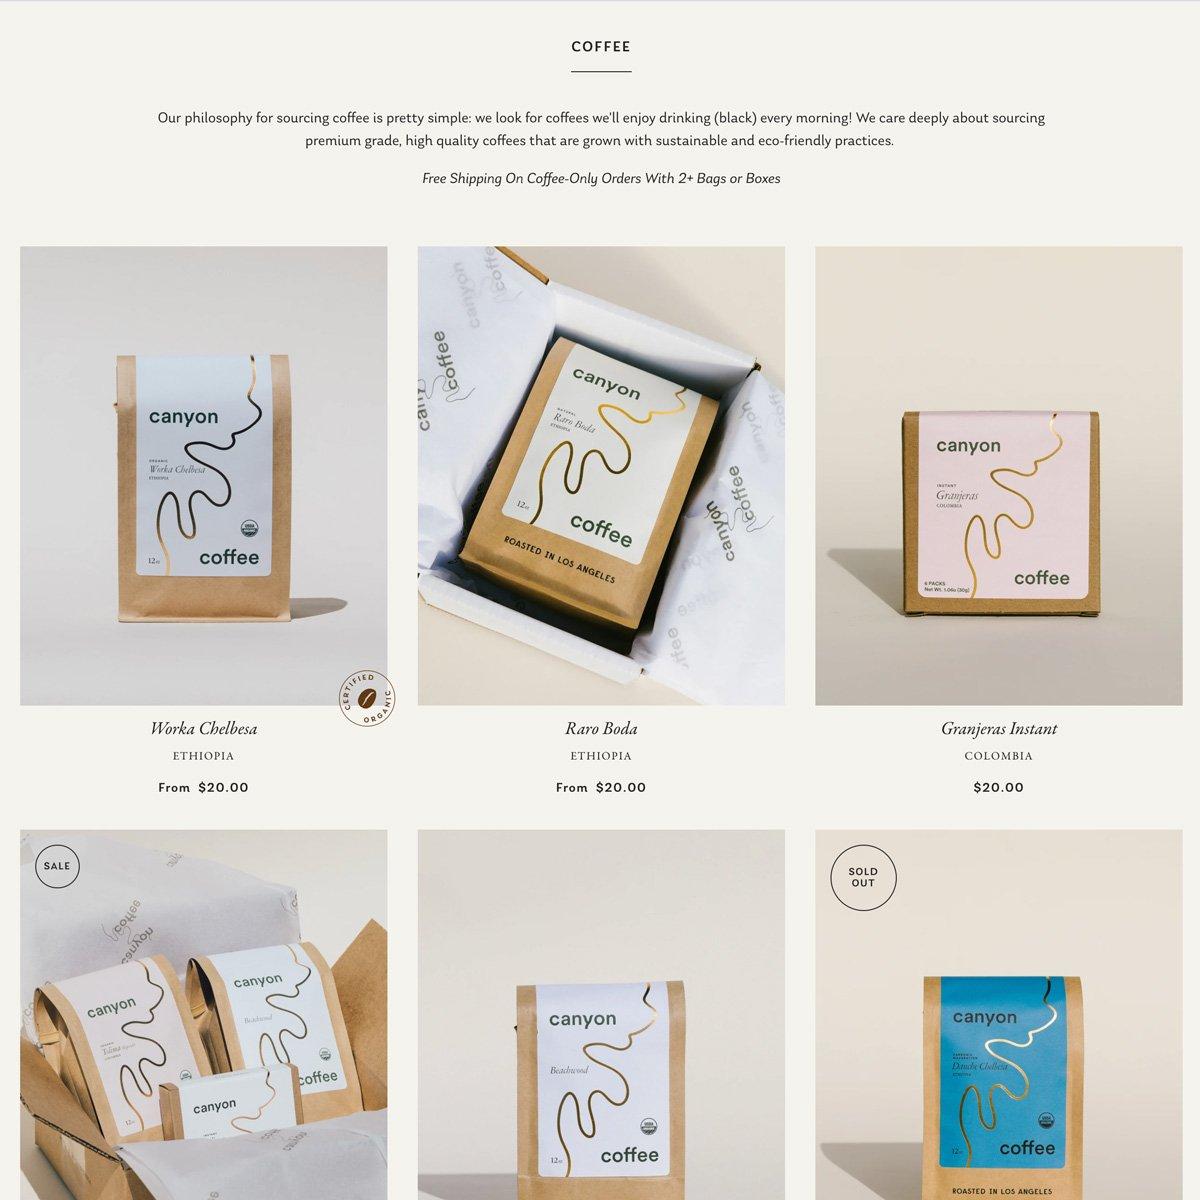 Canyon Coffee Web Design - Desktop - Category